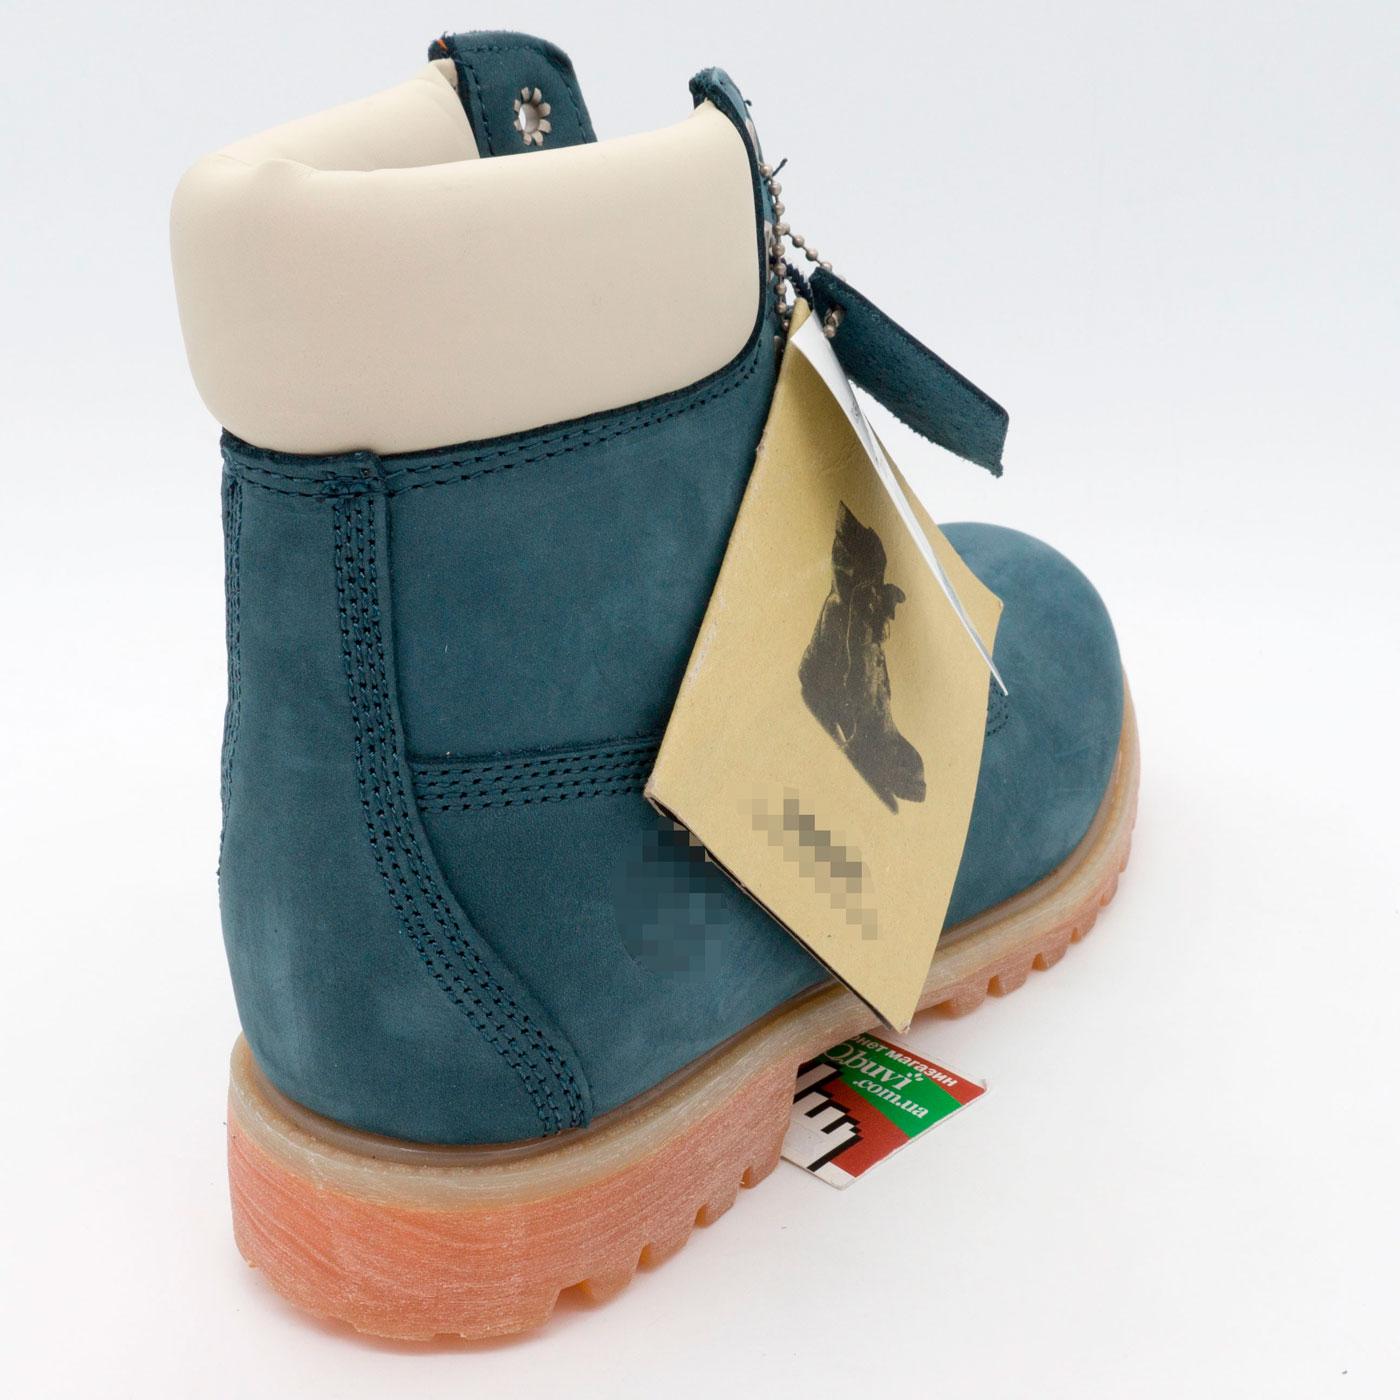 фото bottom Ботинки Тимберленд синие 26578 - Реплика Топ качества! bottom